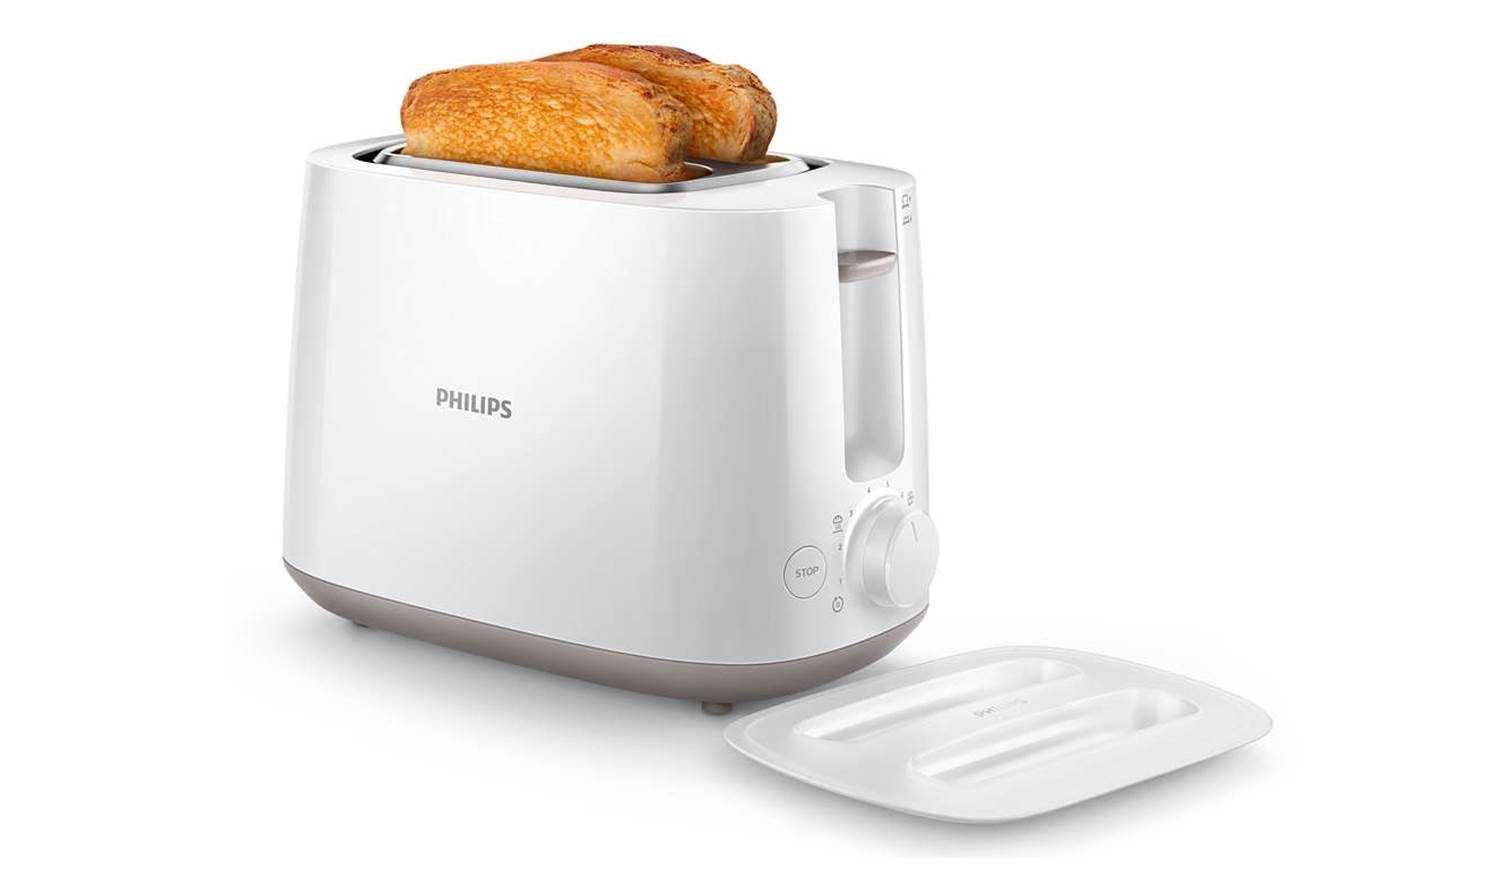 Philips Hd 2582 01 Toaster Harvey Norman Singapore